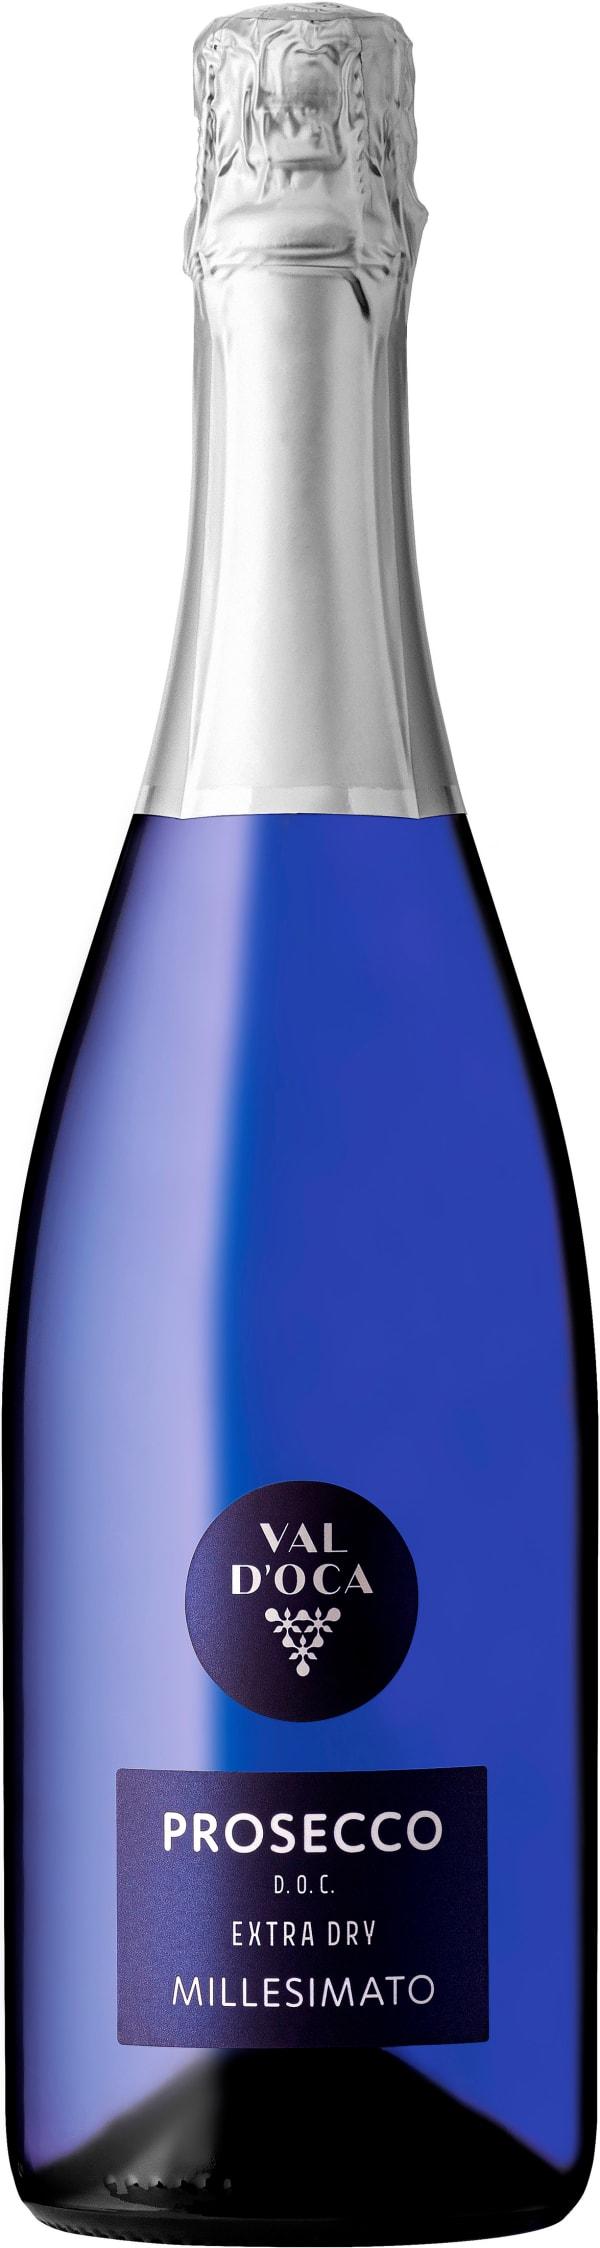 Val d'Oca Millesimato Prosecco Extra Dry 2017